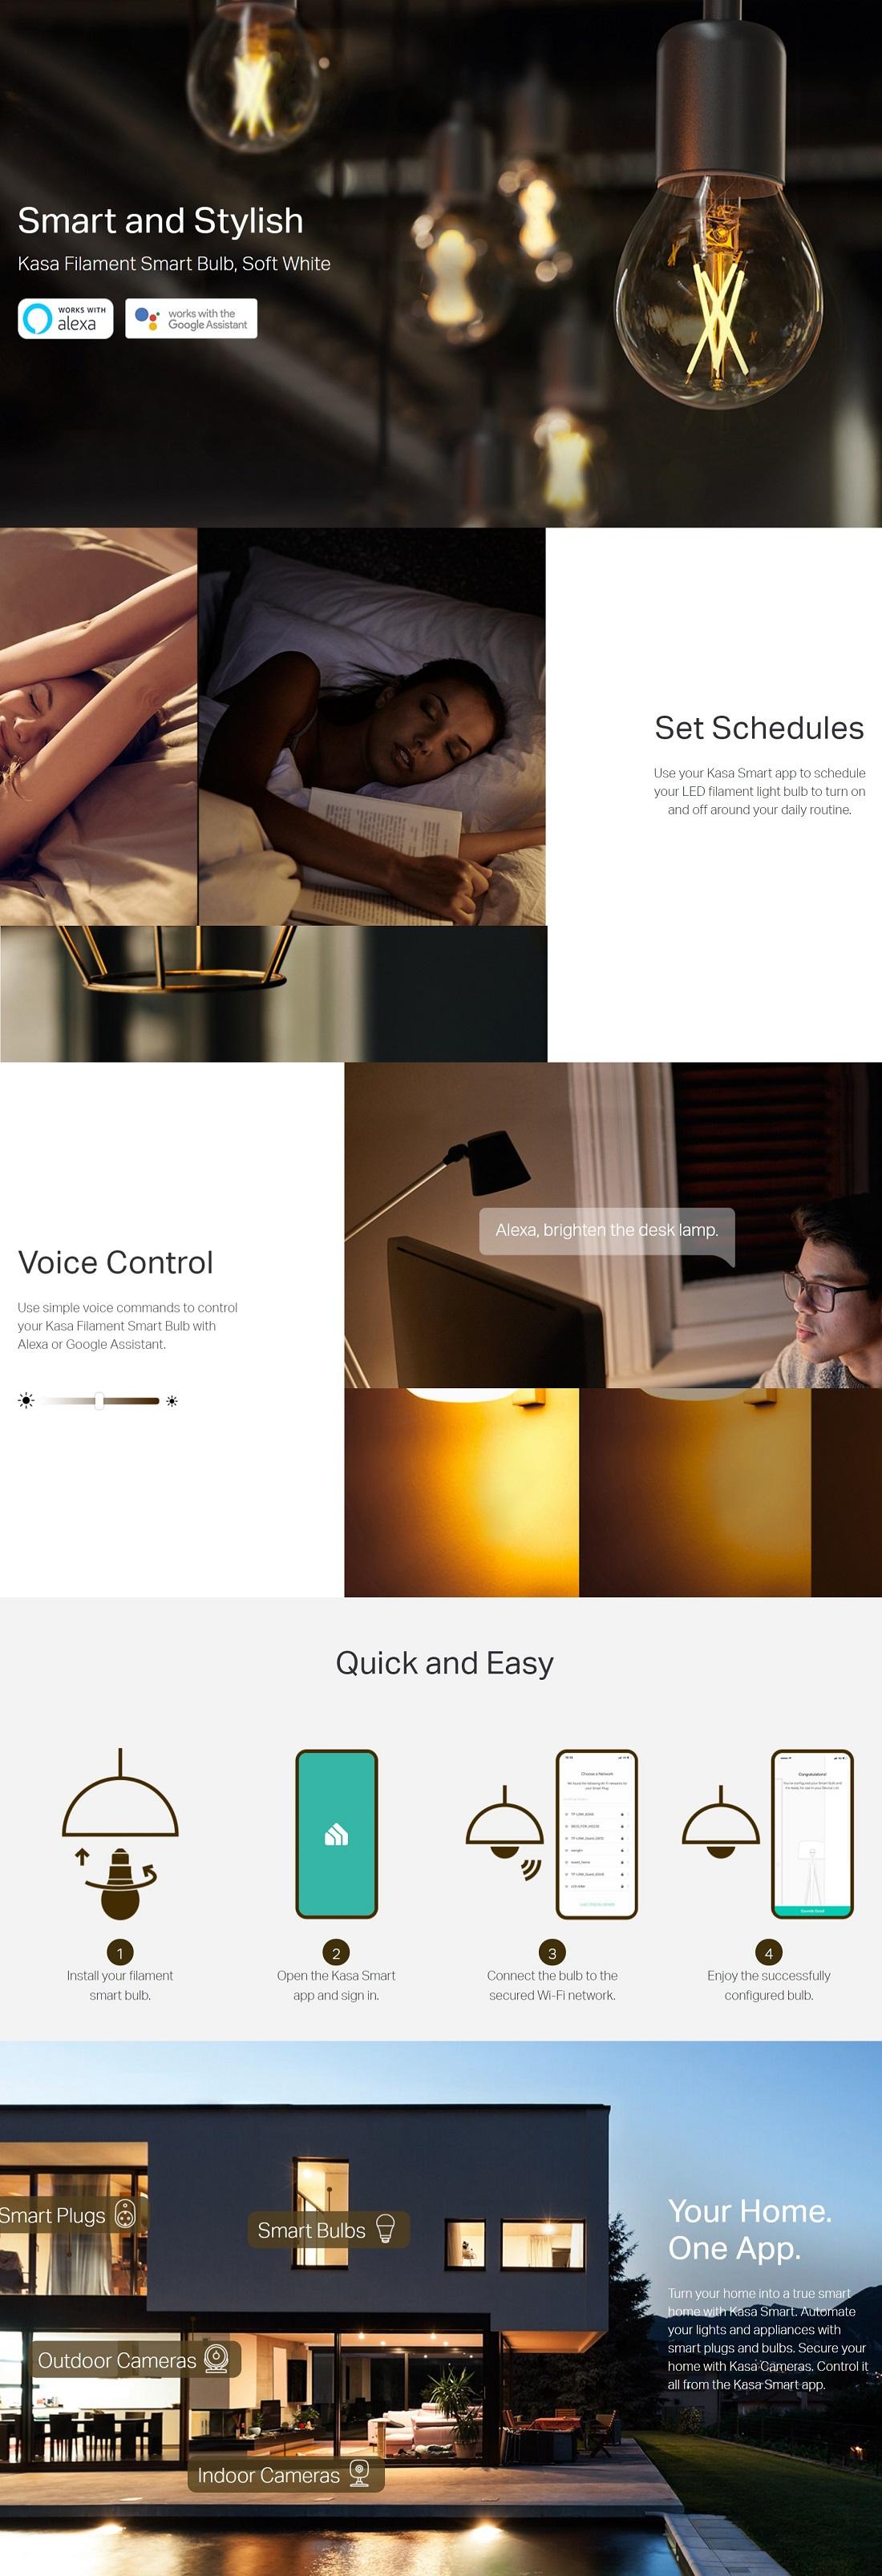 TP-Link KL50 Kasa Filament Smart Bulb Soft White Edison Screw Voice Control